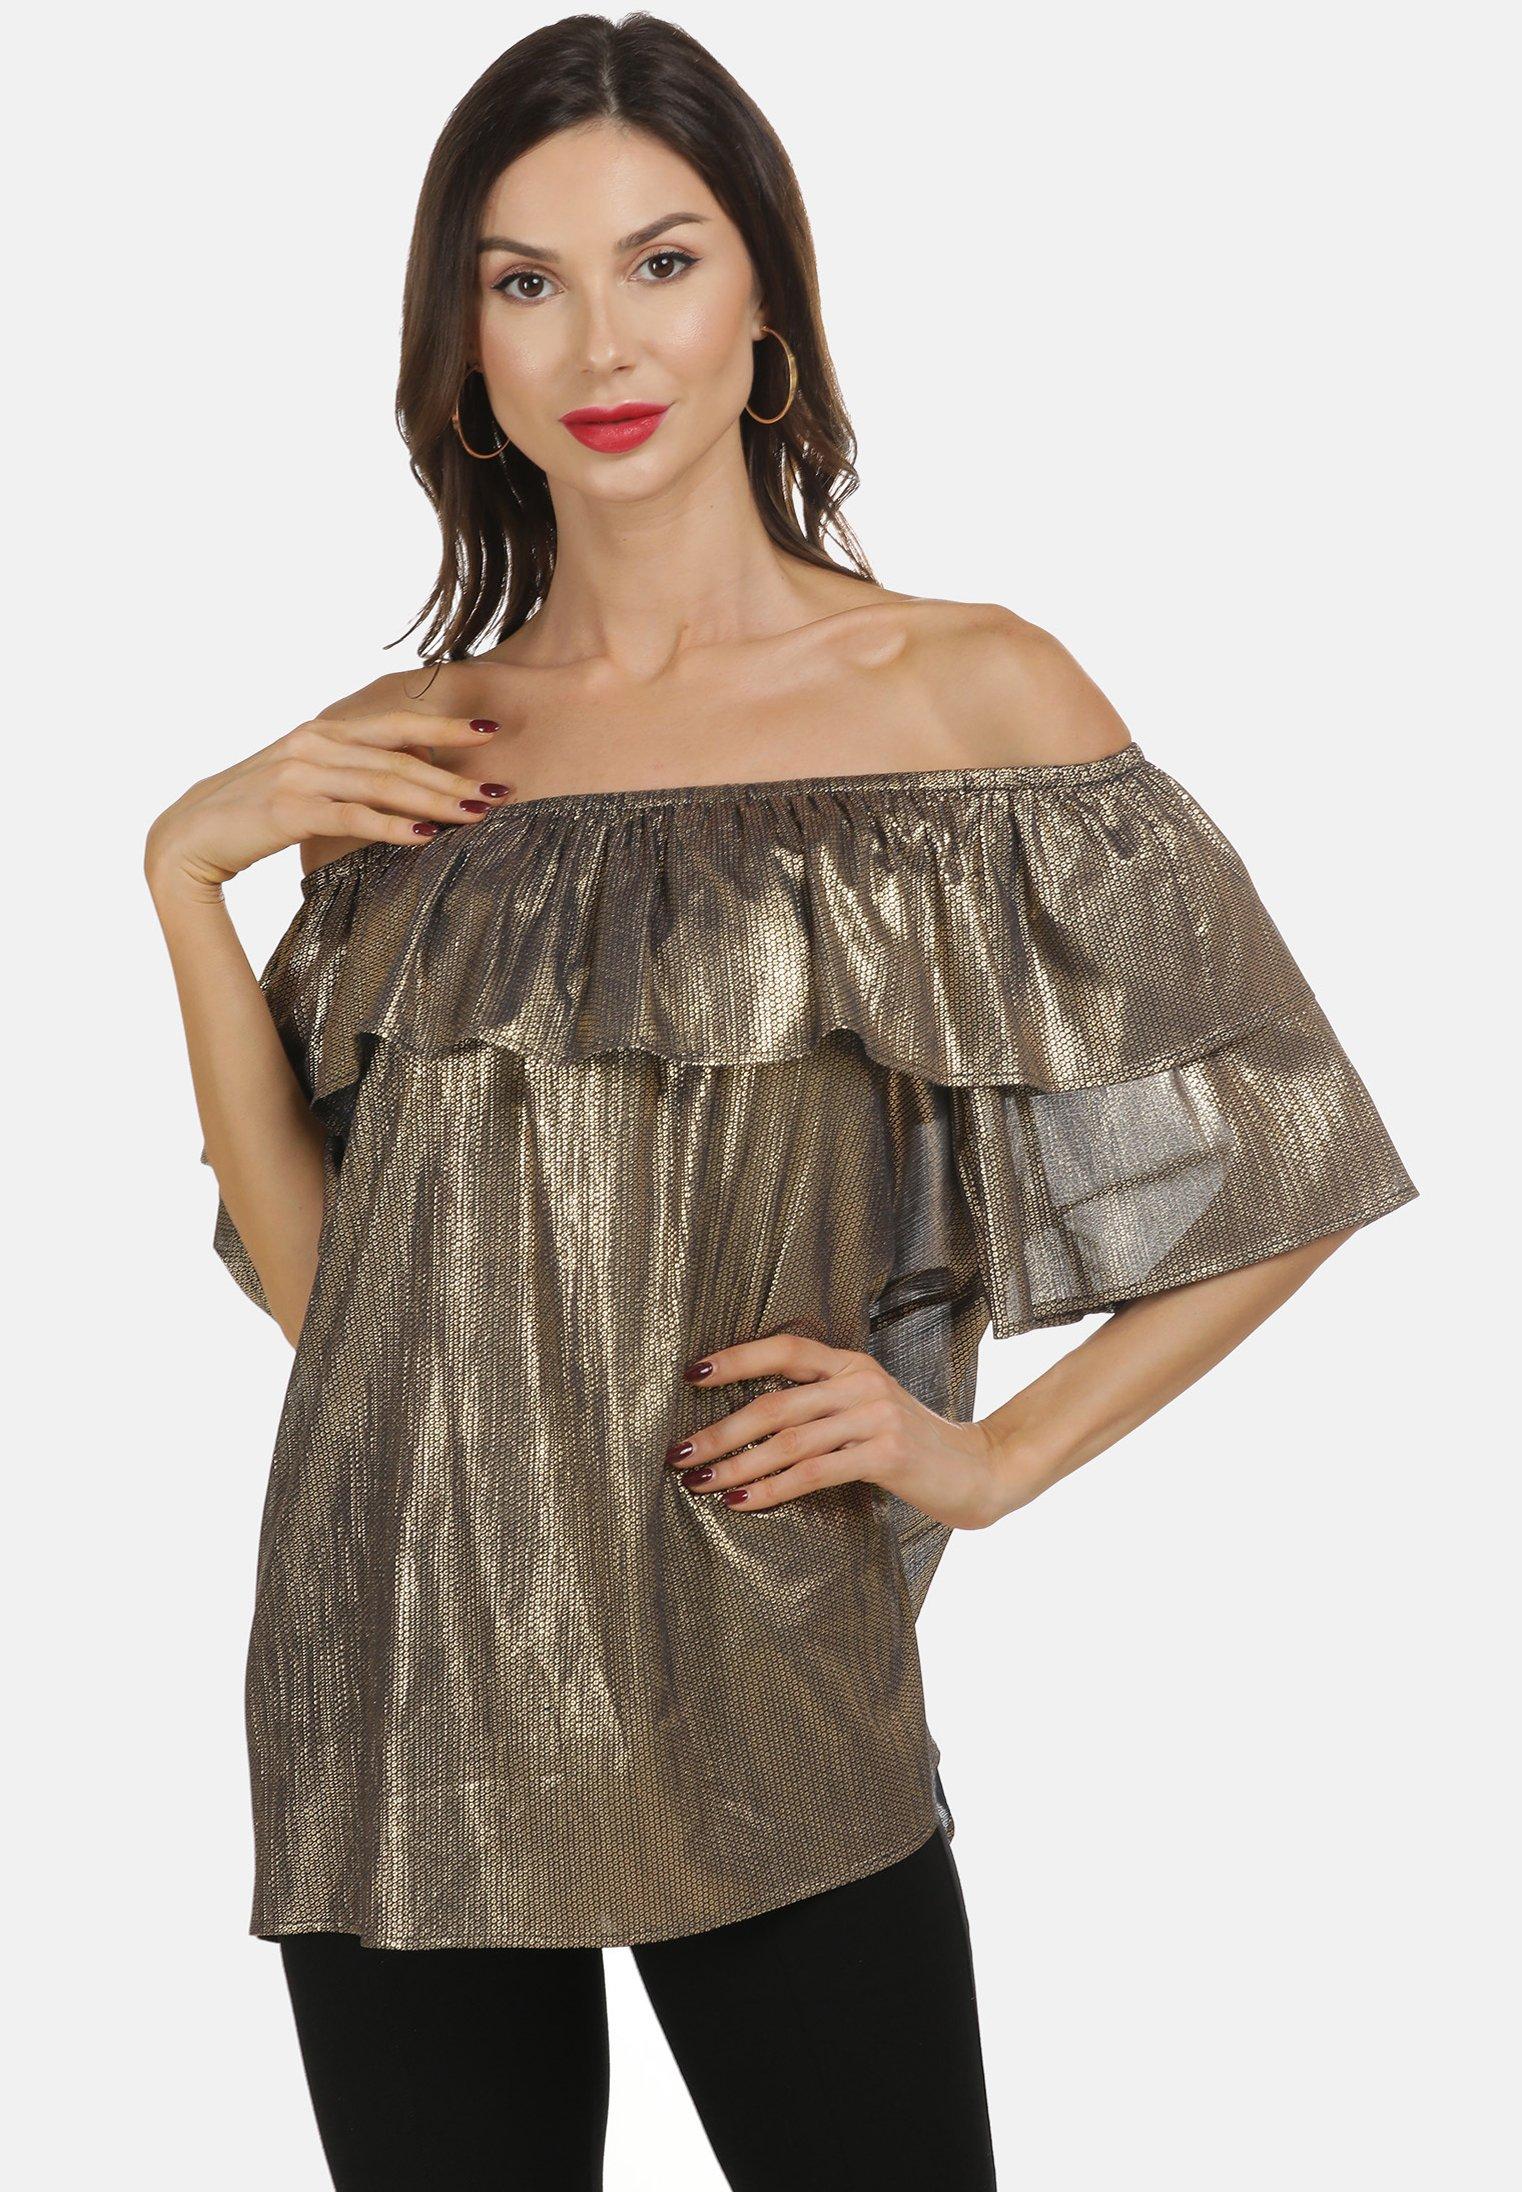 Recommend Women's Clothing faina CARMEN Blouse schwarz gold Fe0dD1u6A